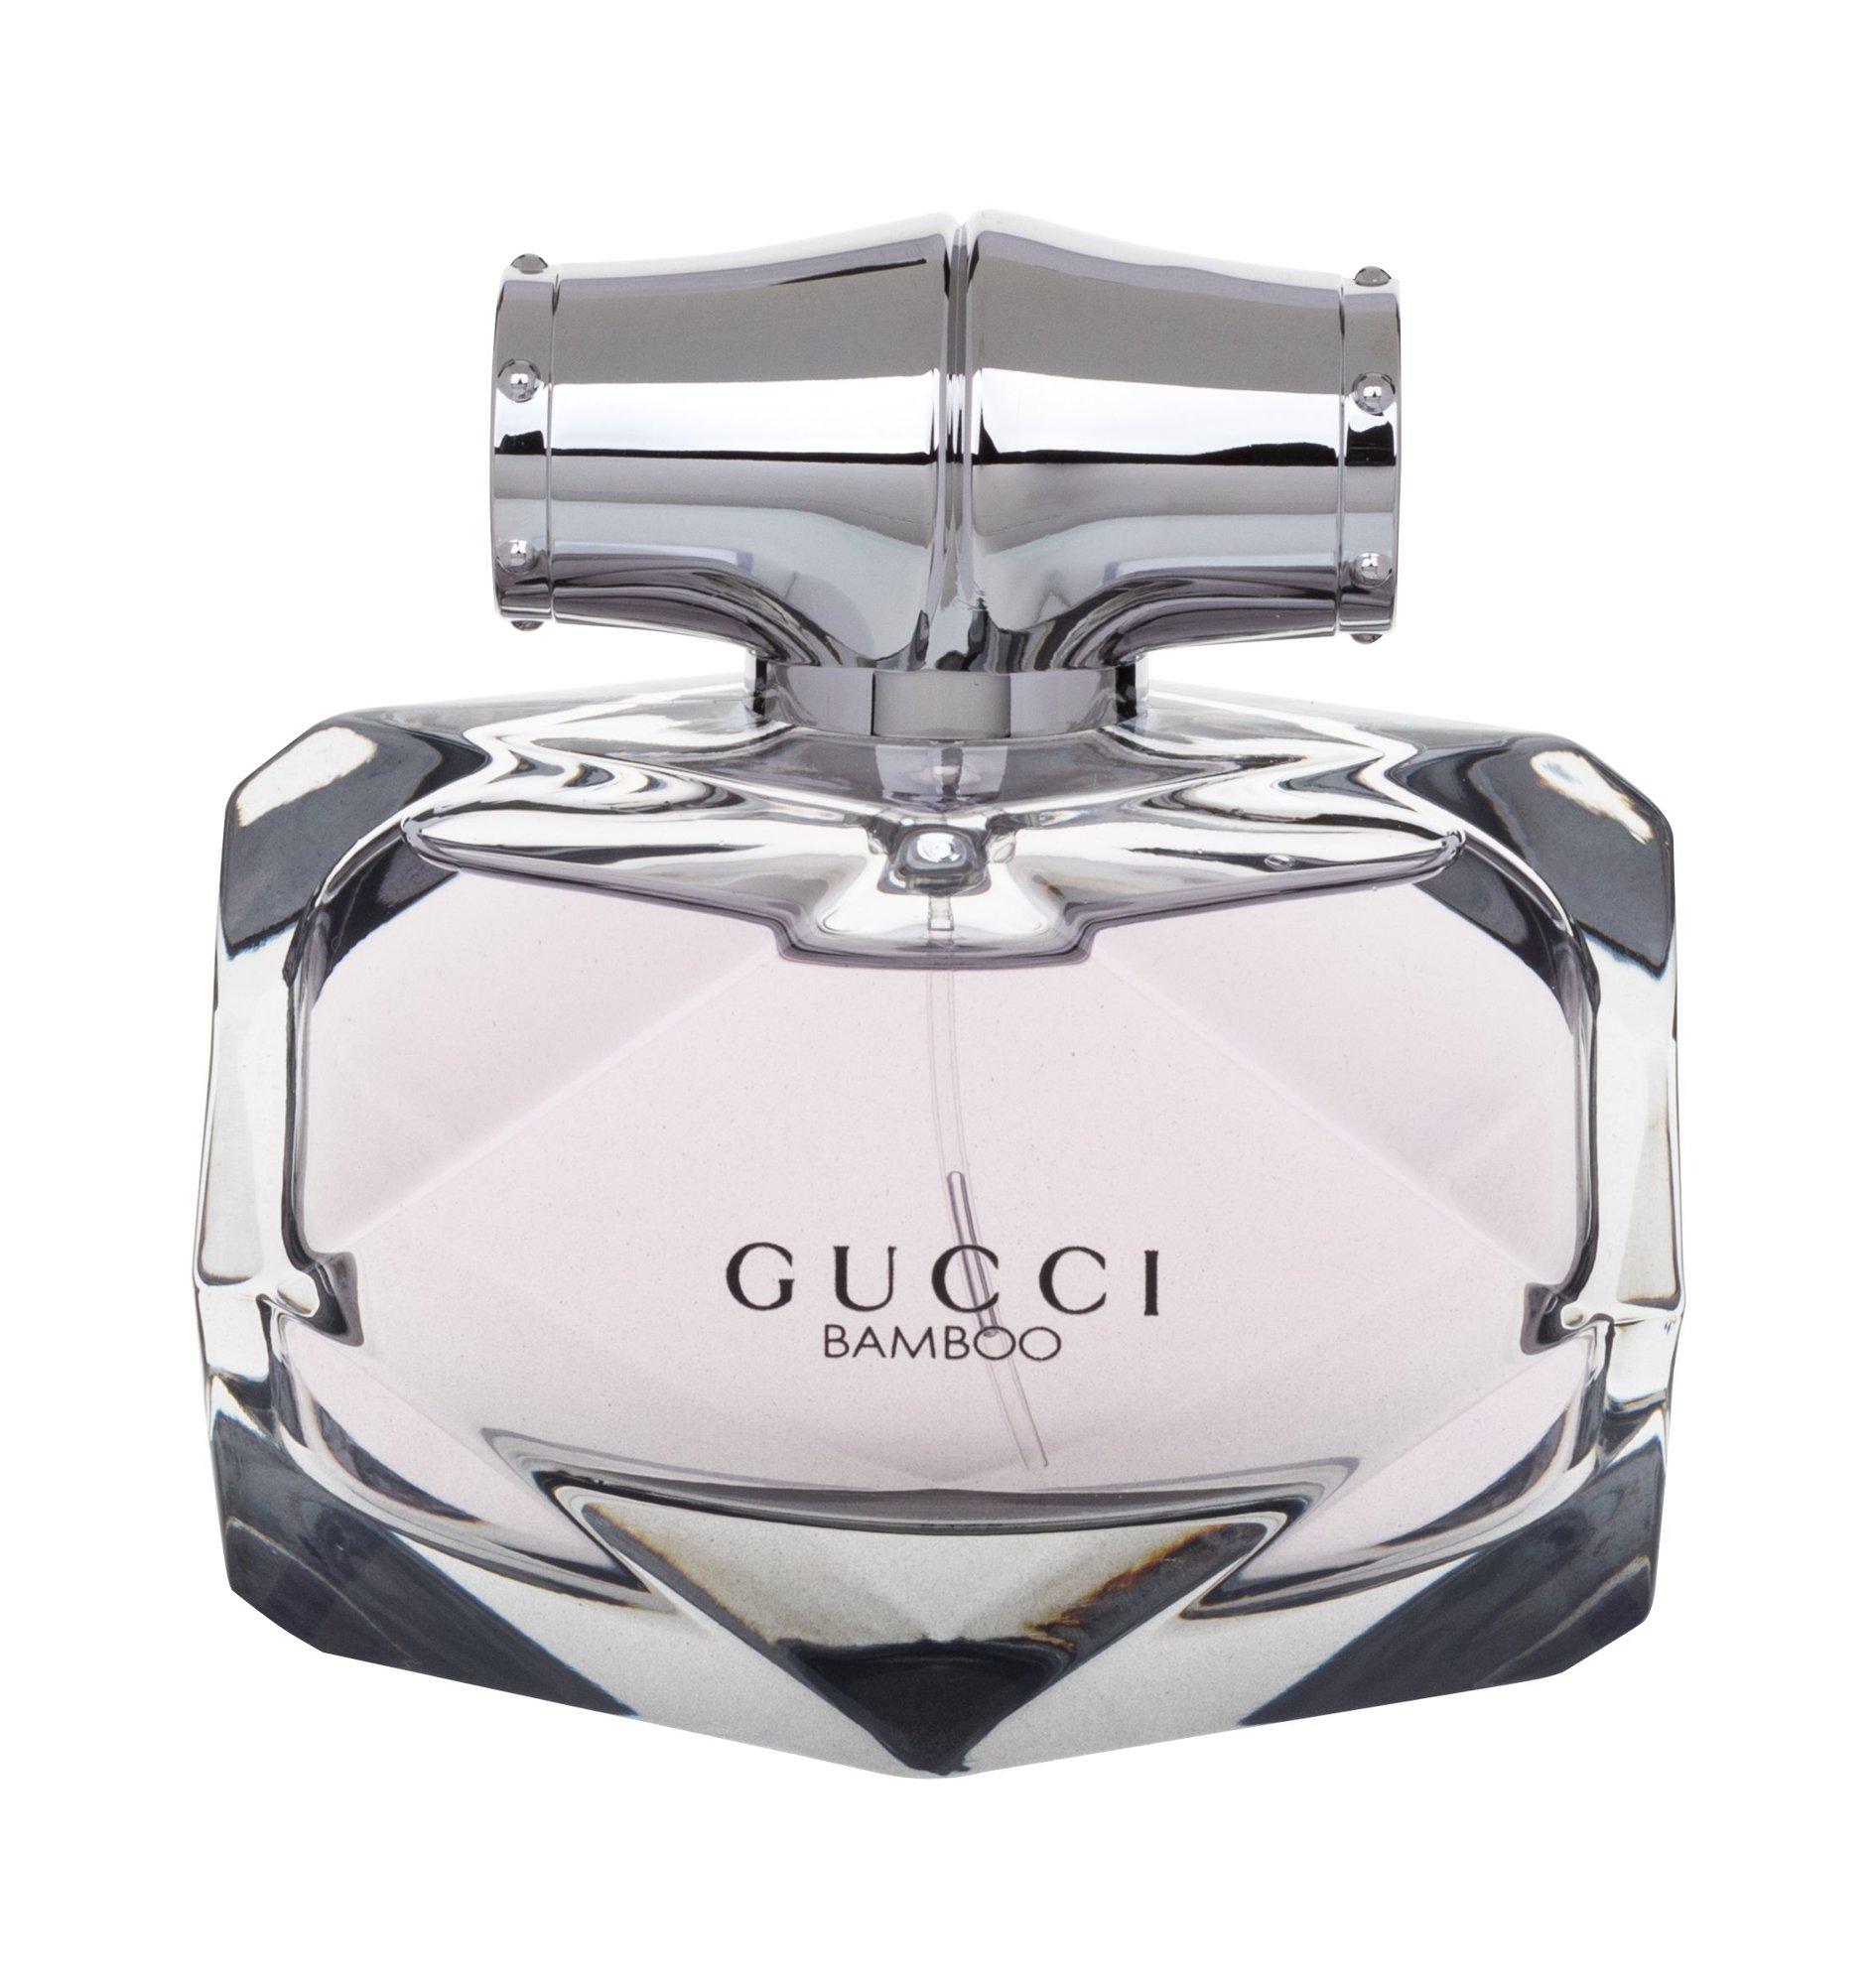 Gucci Gucci Bamboo Eau de Parfum 75ml